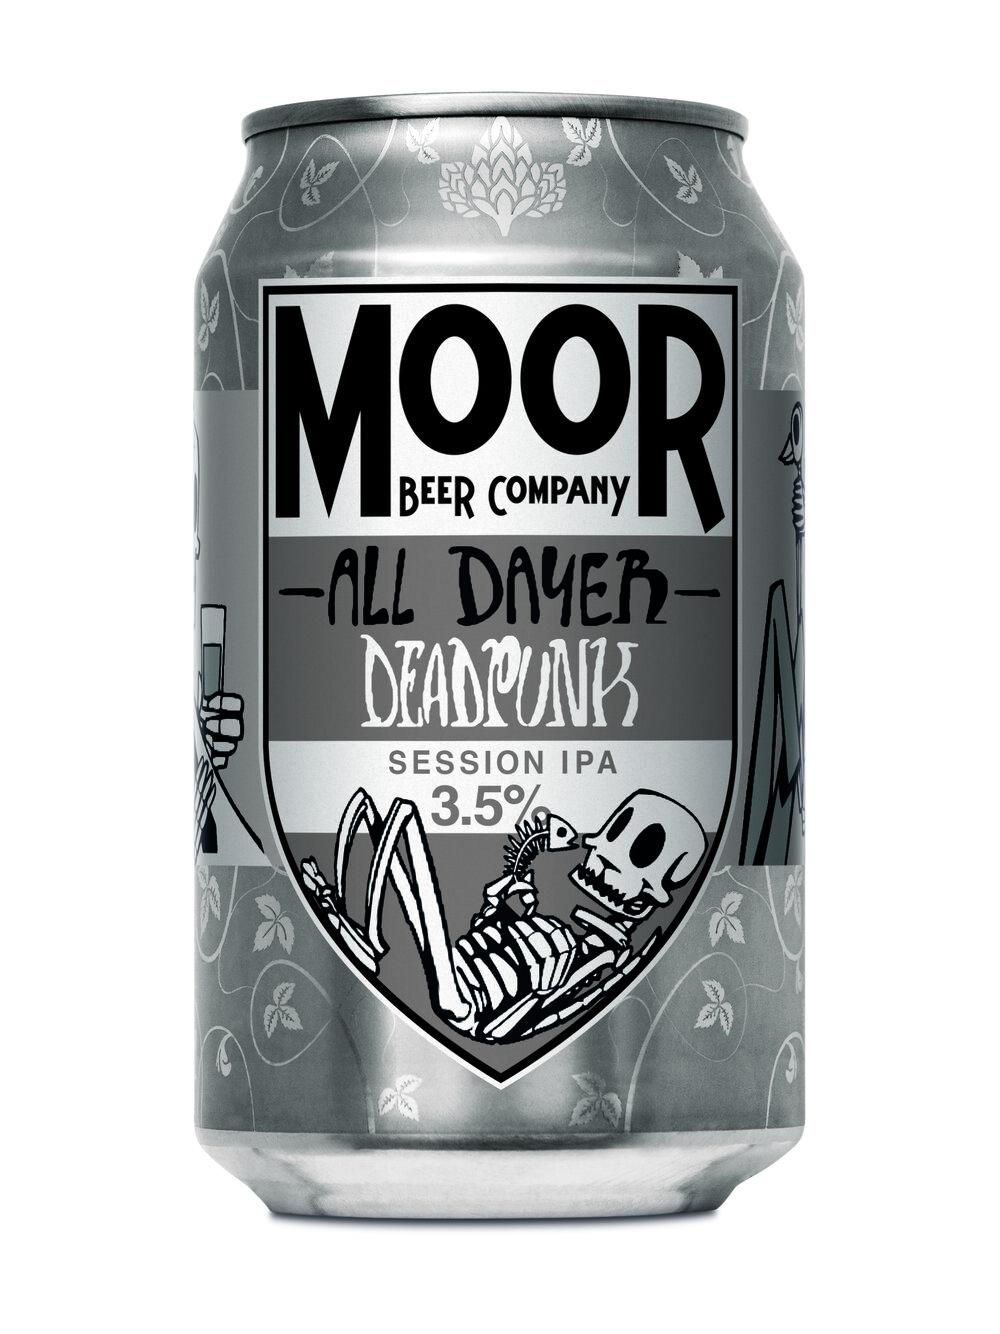 Moor | AllDayer | Session IPA 3.5% 330ml